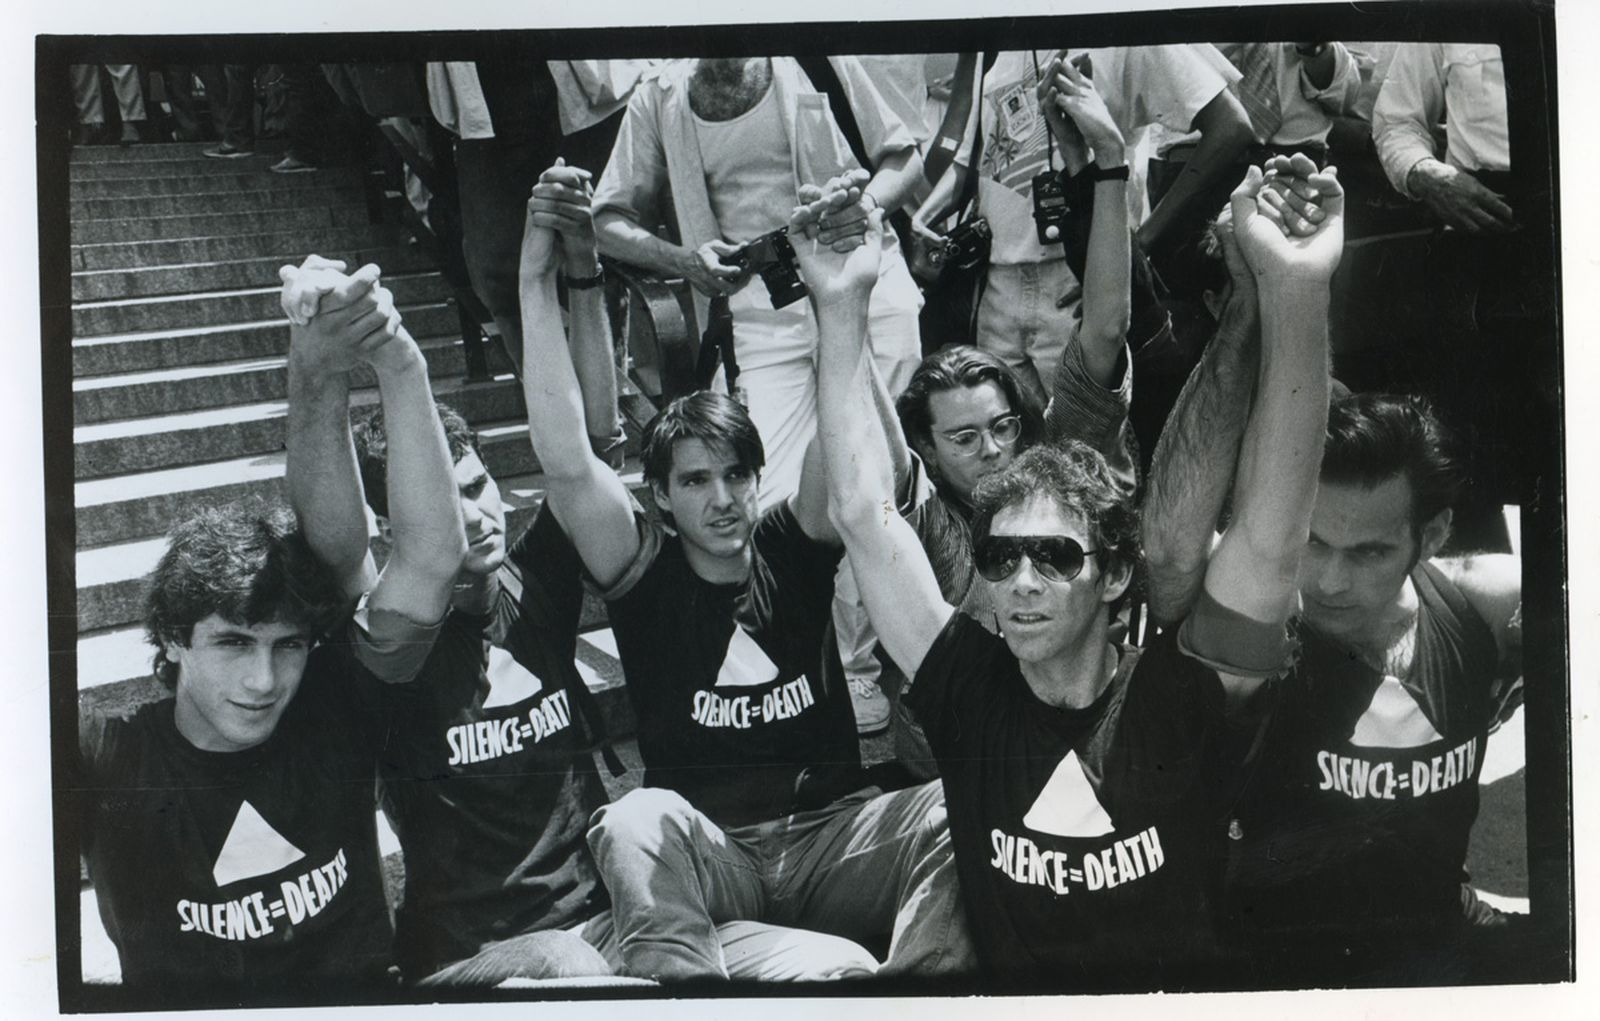 ACT-UP Demo Federal Plaza NYC June 30, 1987 From left: Steve Gendon, Mark Aurigemma, Douglas Montgomery, Charles Stinson, Frank O'Dowd, Avram Finkelstein.